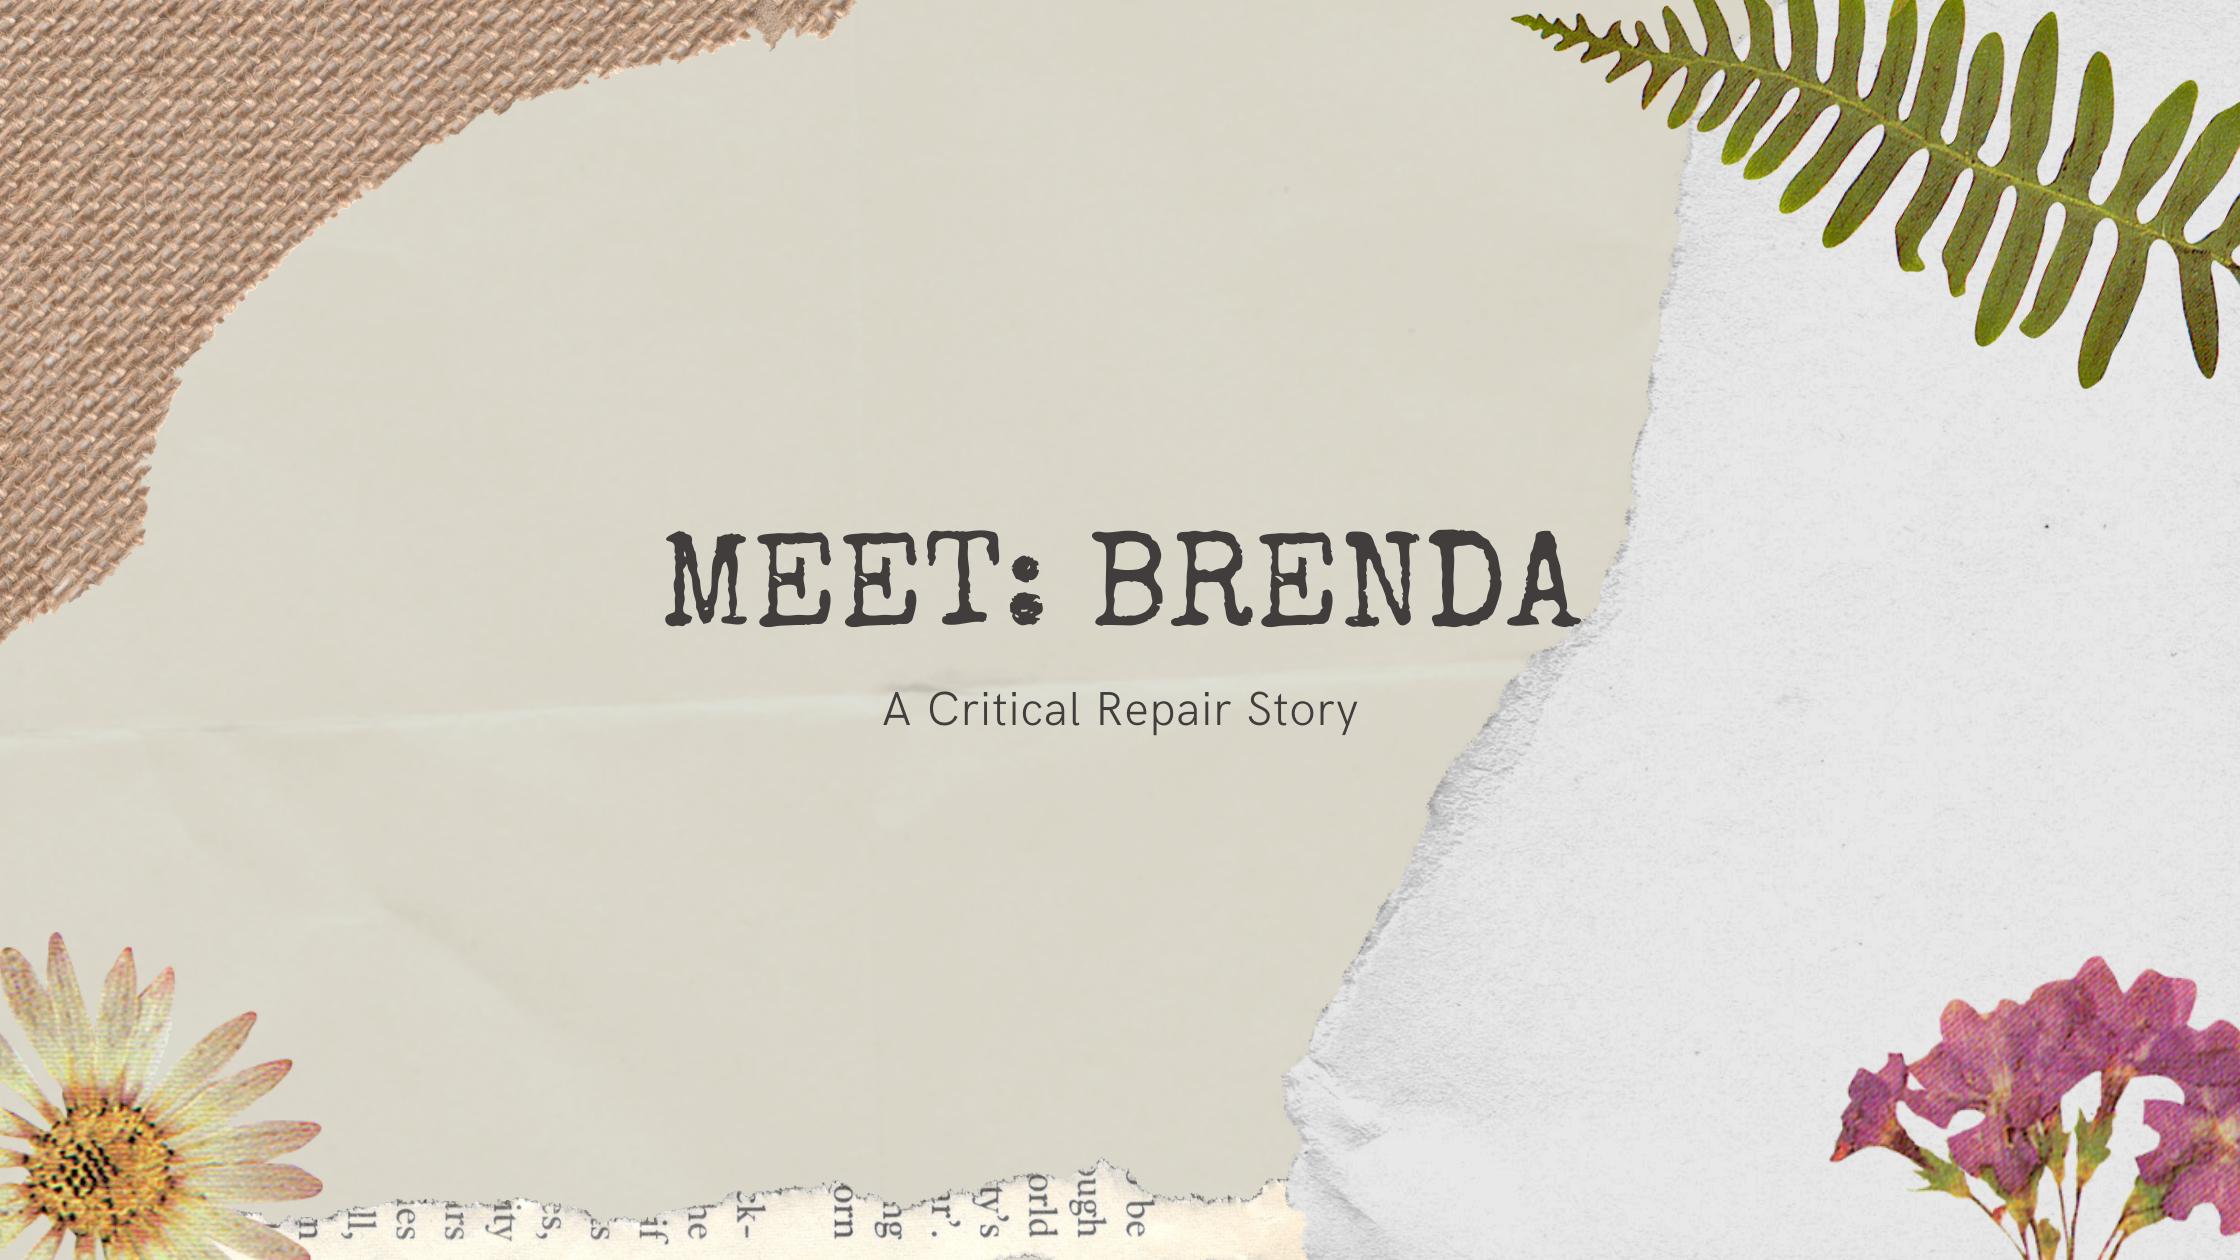 Meet: Brenda